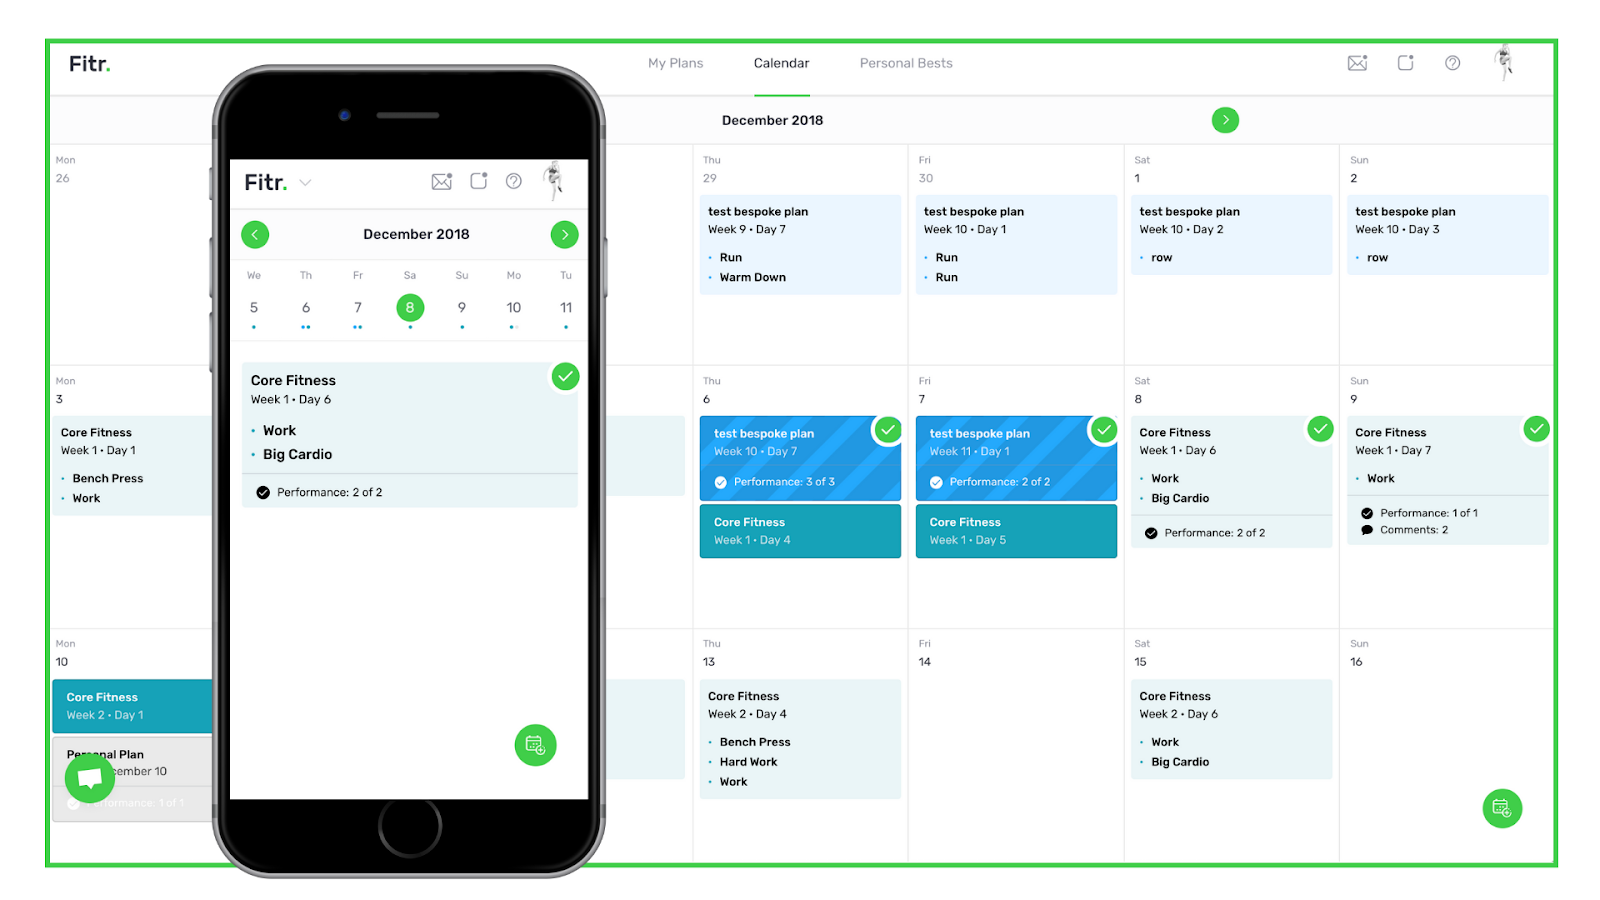 Screenshot of Fitr online fitness coaching platform